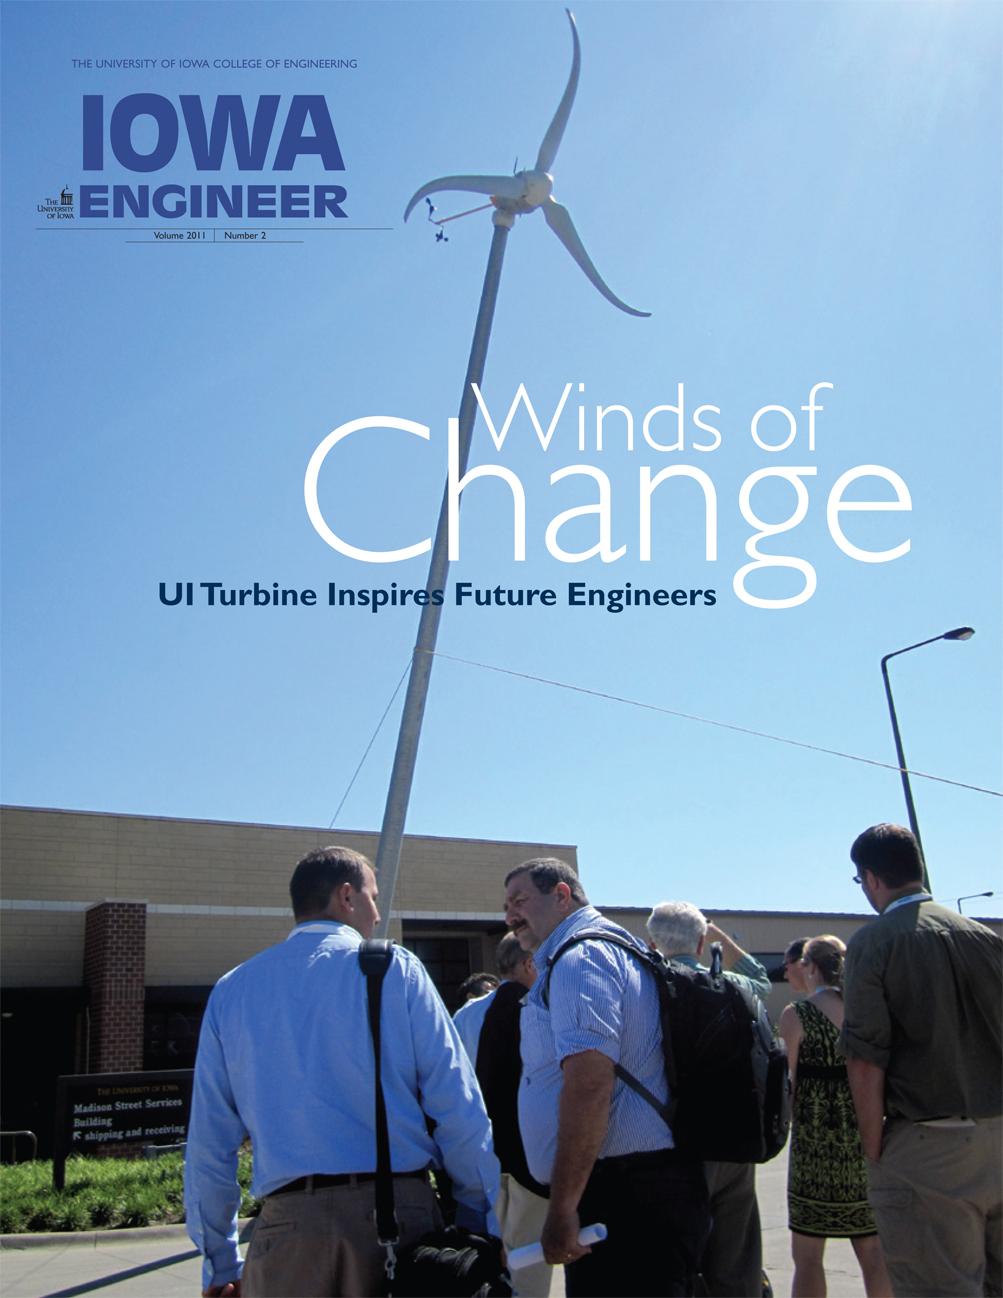 Cover of Iowa Engineer